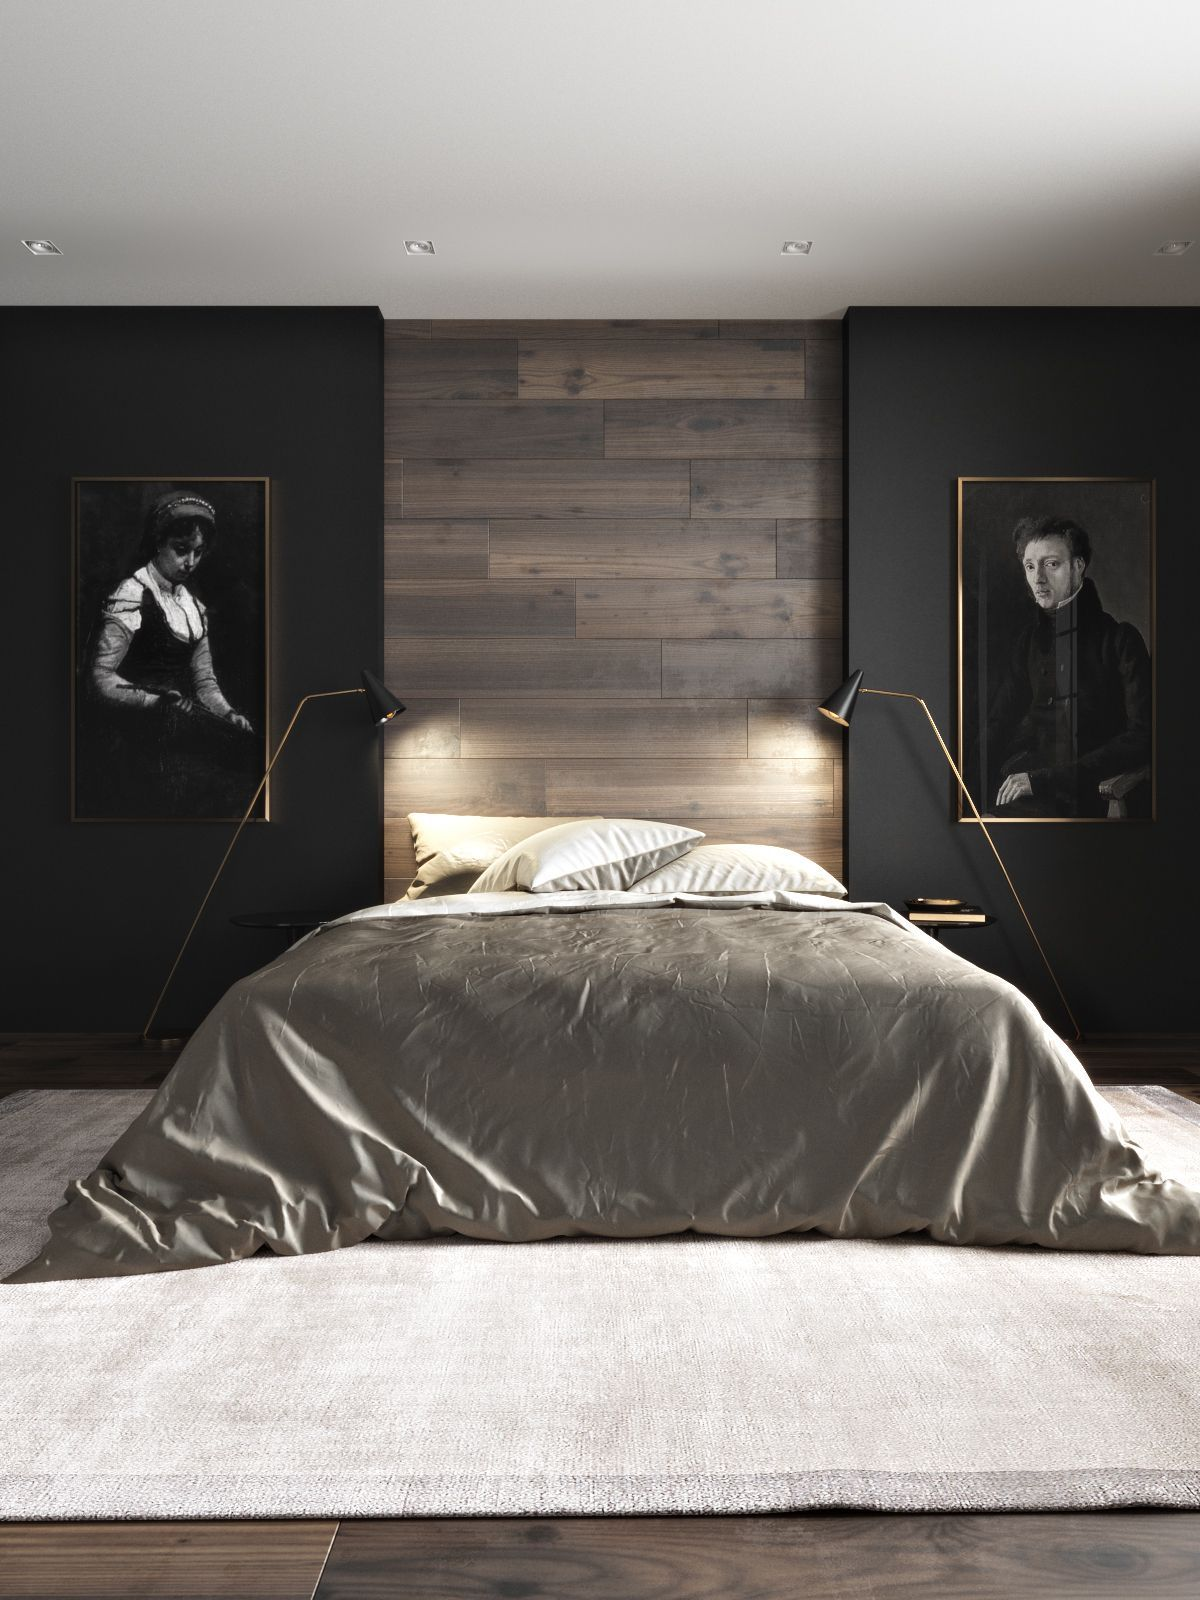 Hd 0132 On Behance Bedroom Lamps Design Modern Bedroom Design